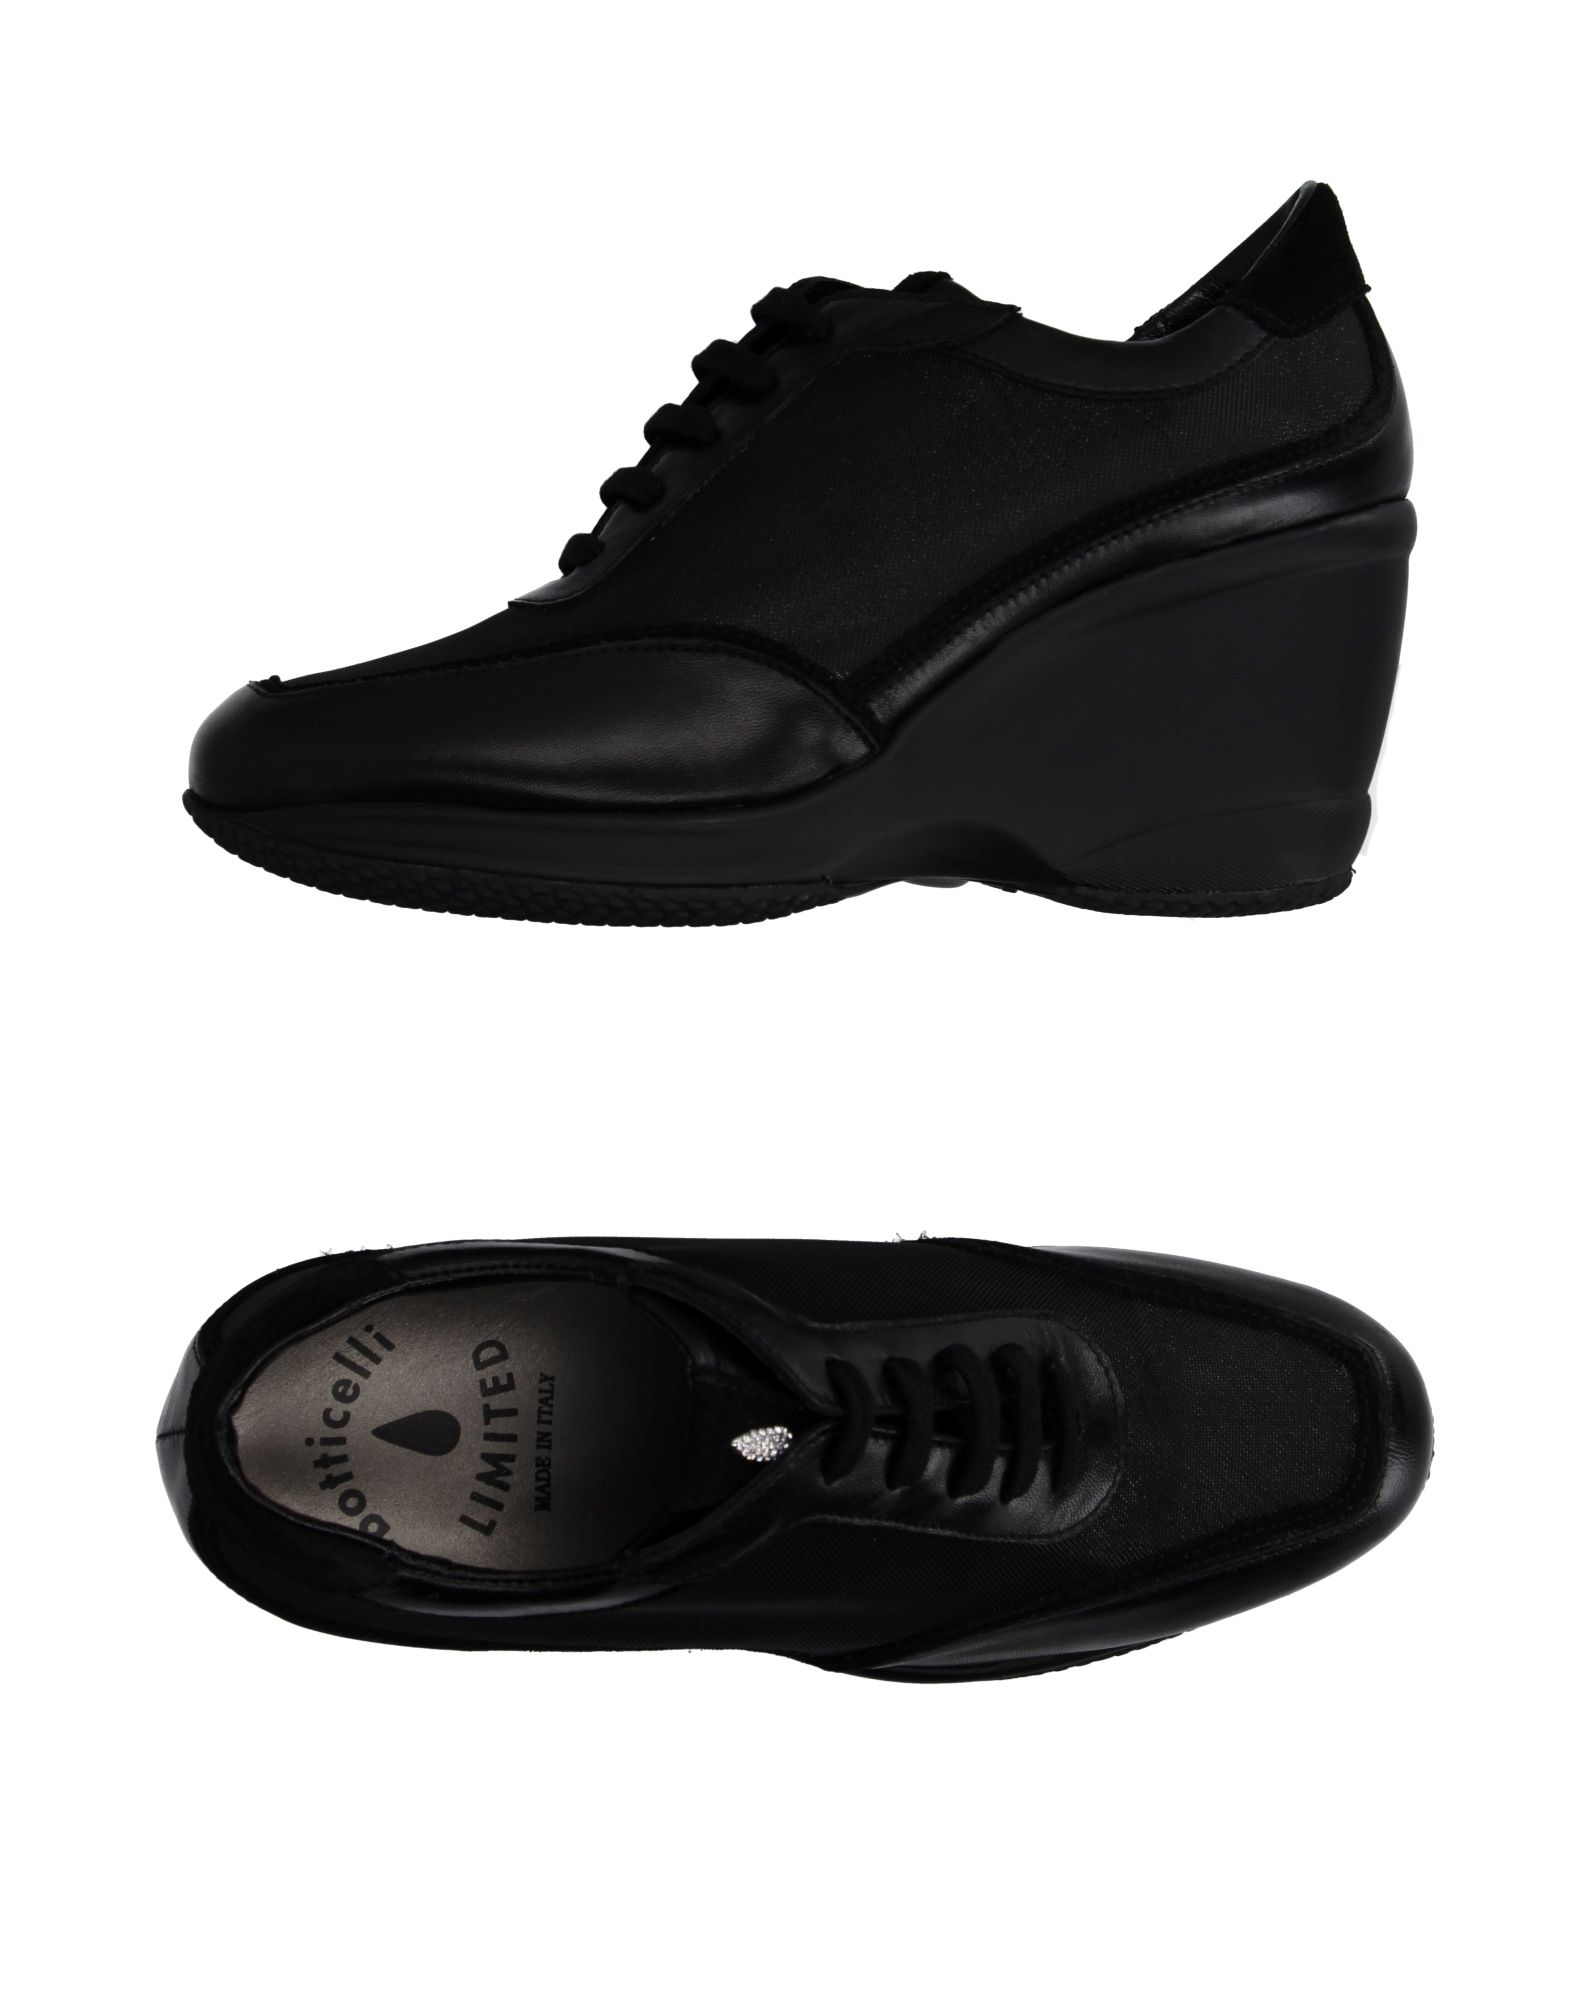 Botticelli Limited Schnürschuhe Damen  11059851VW Gute Qualität beliebte Schuhe